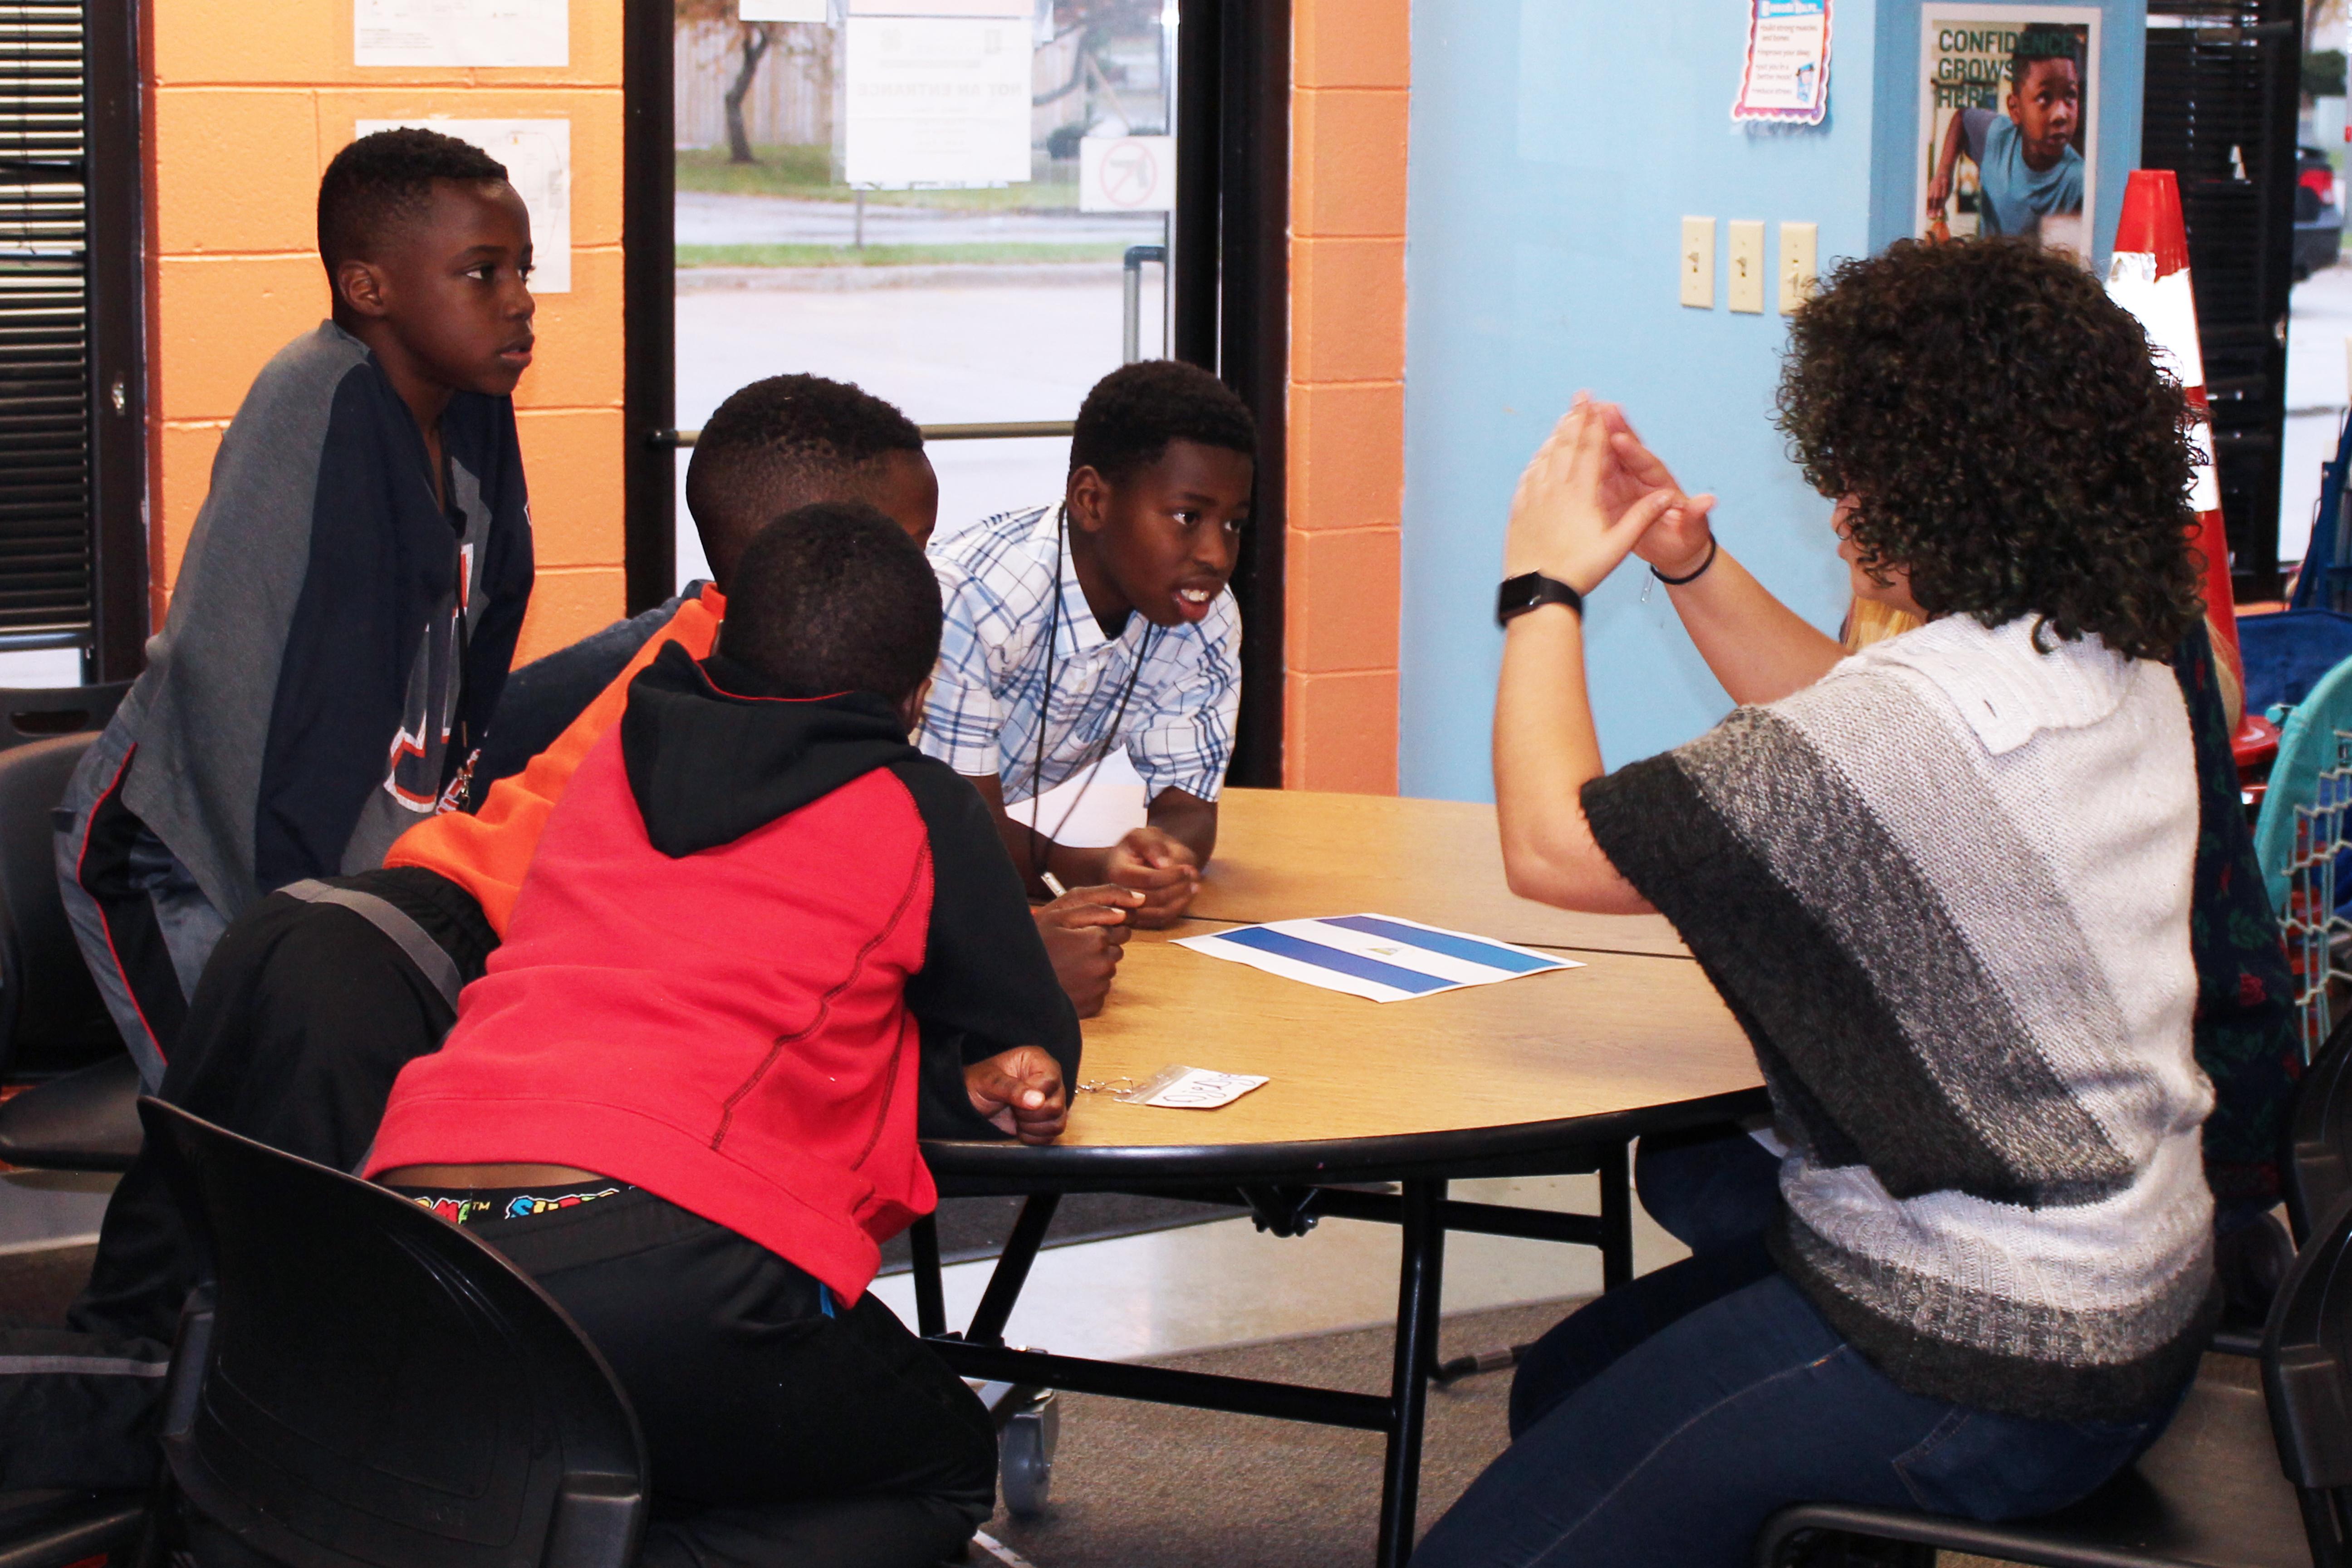 ISU students work with Unity youth